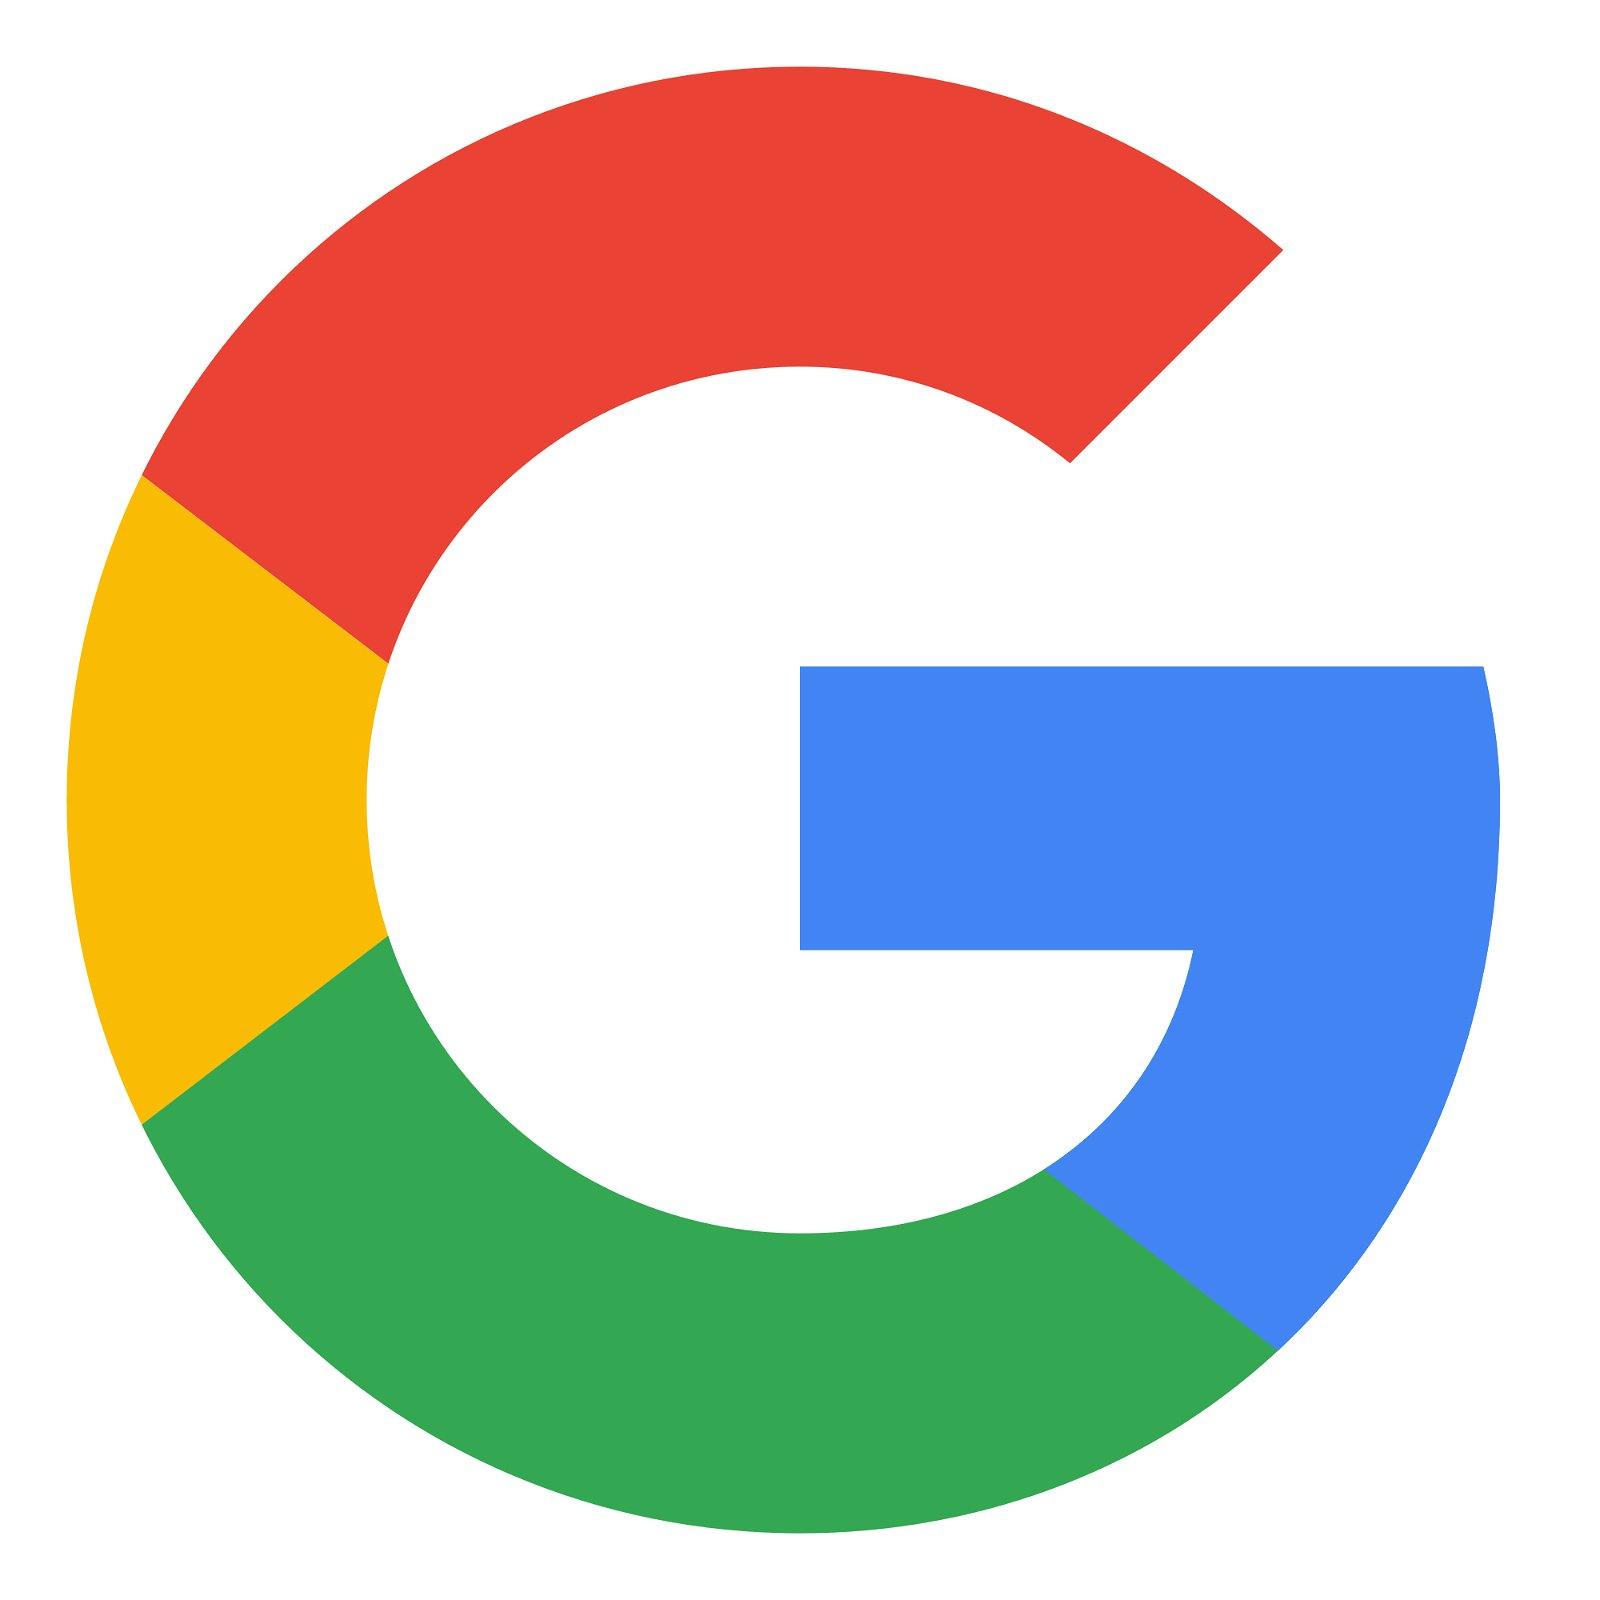 Google Pixel 2 XL Review: A Controversial Flagship 3